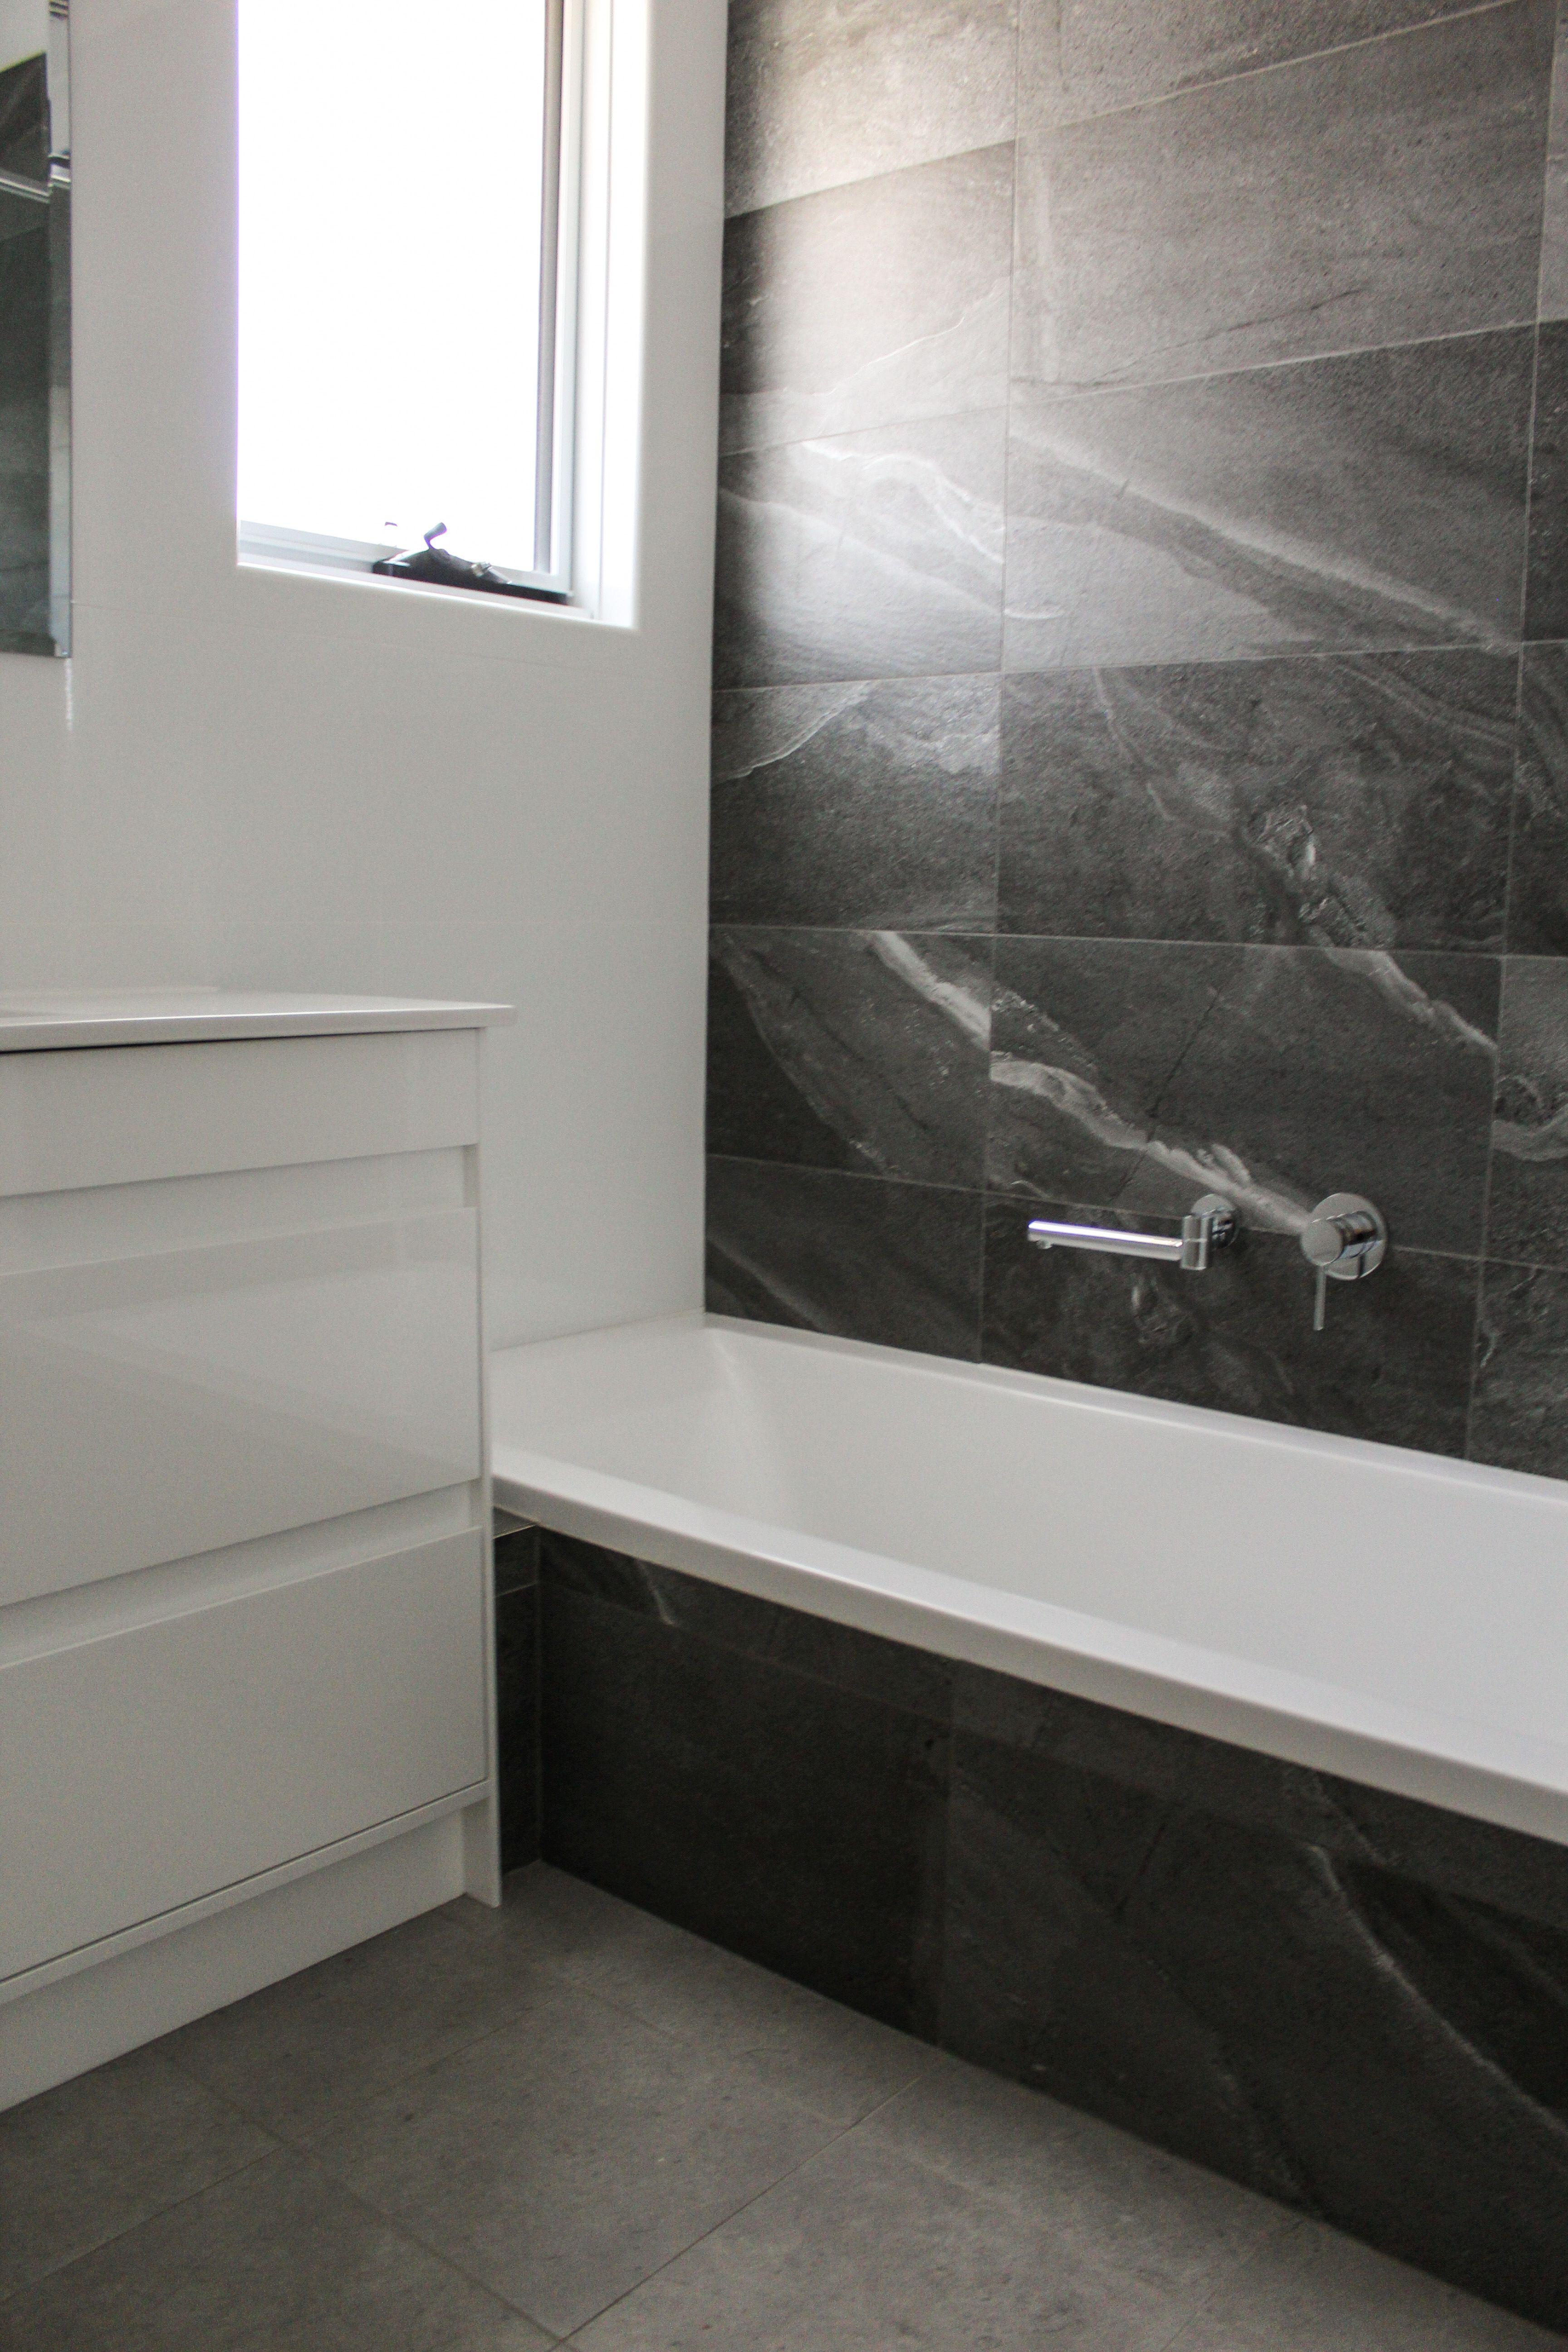 Bathroom Ideas Charcoal Bathroom Charcoal And Grey Bathroom Bathrooms Perth Bathroom Inspirat Grey Bathrooms Bathroom Renovation Trends Bathroom Trends